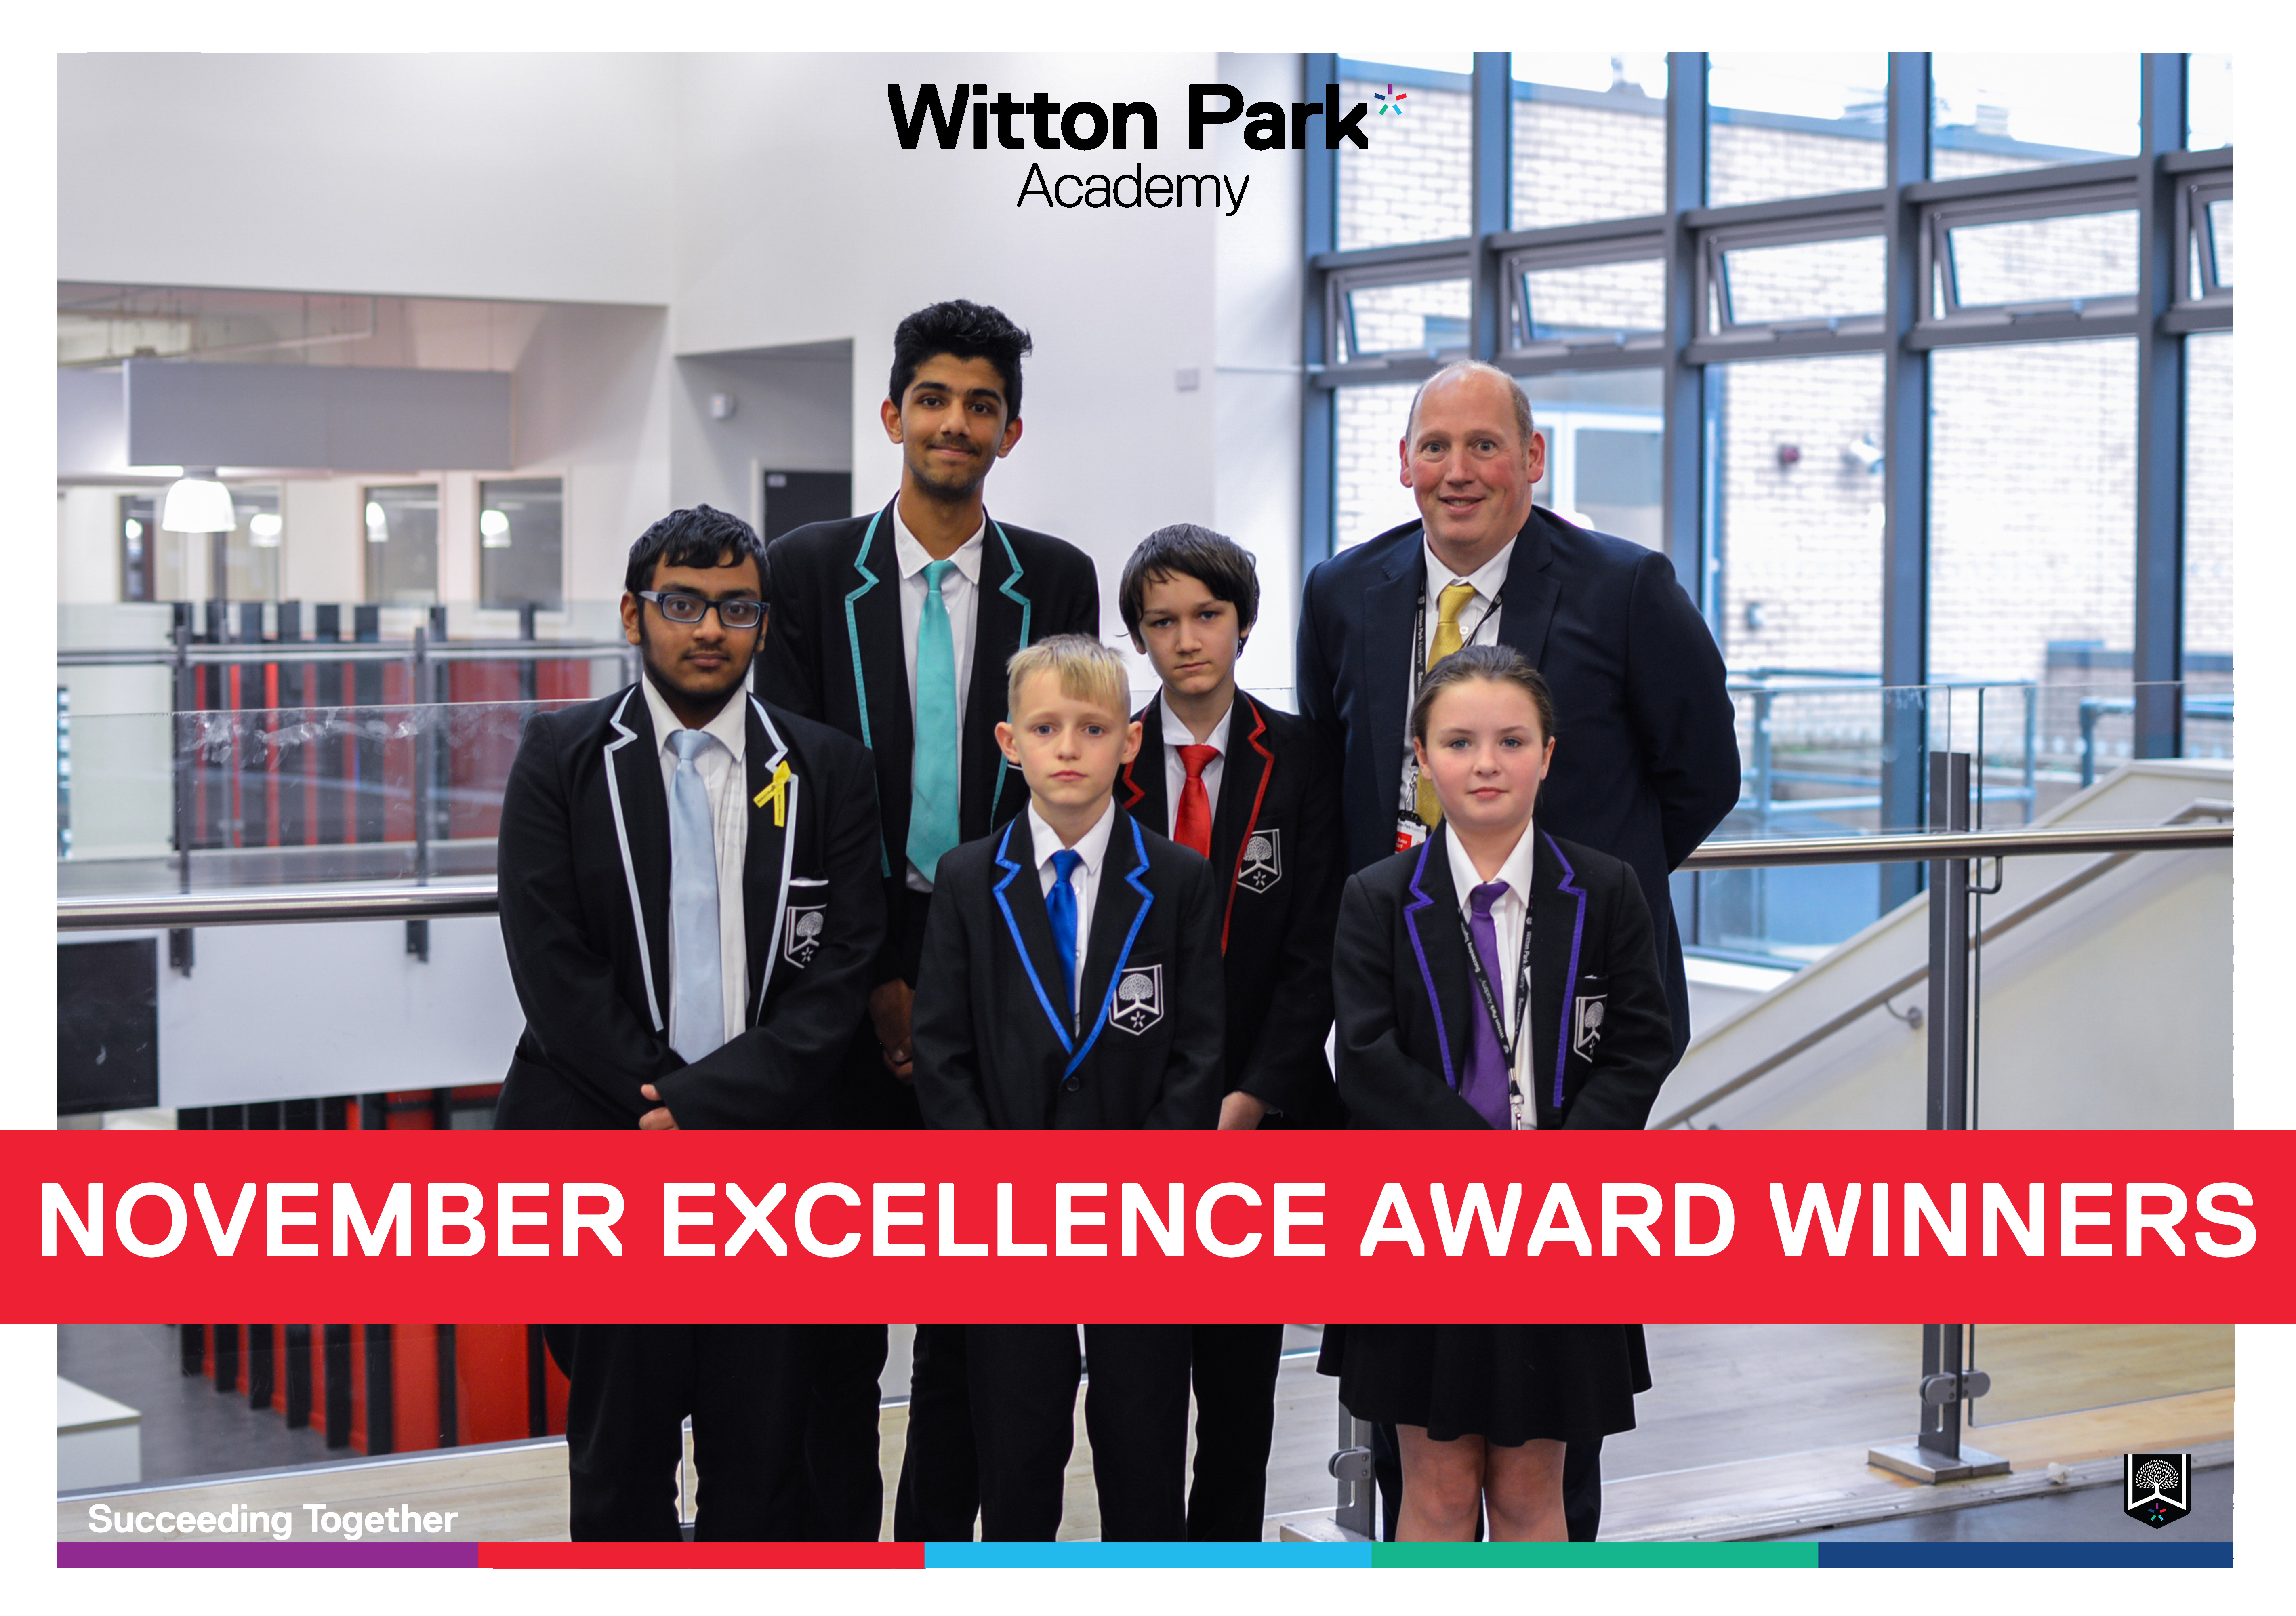 Excellence Awards Winners November 2019